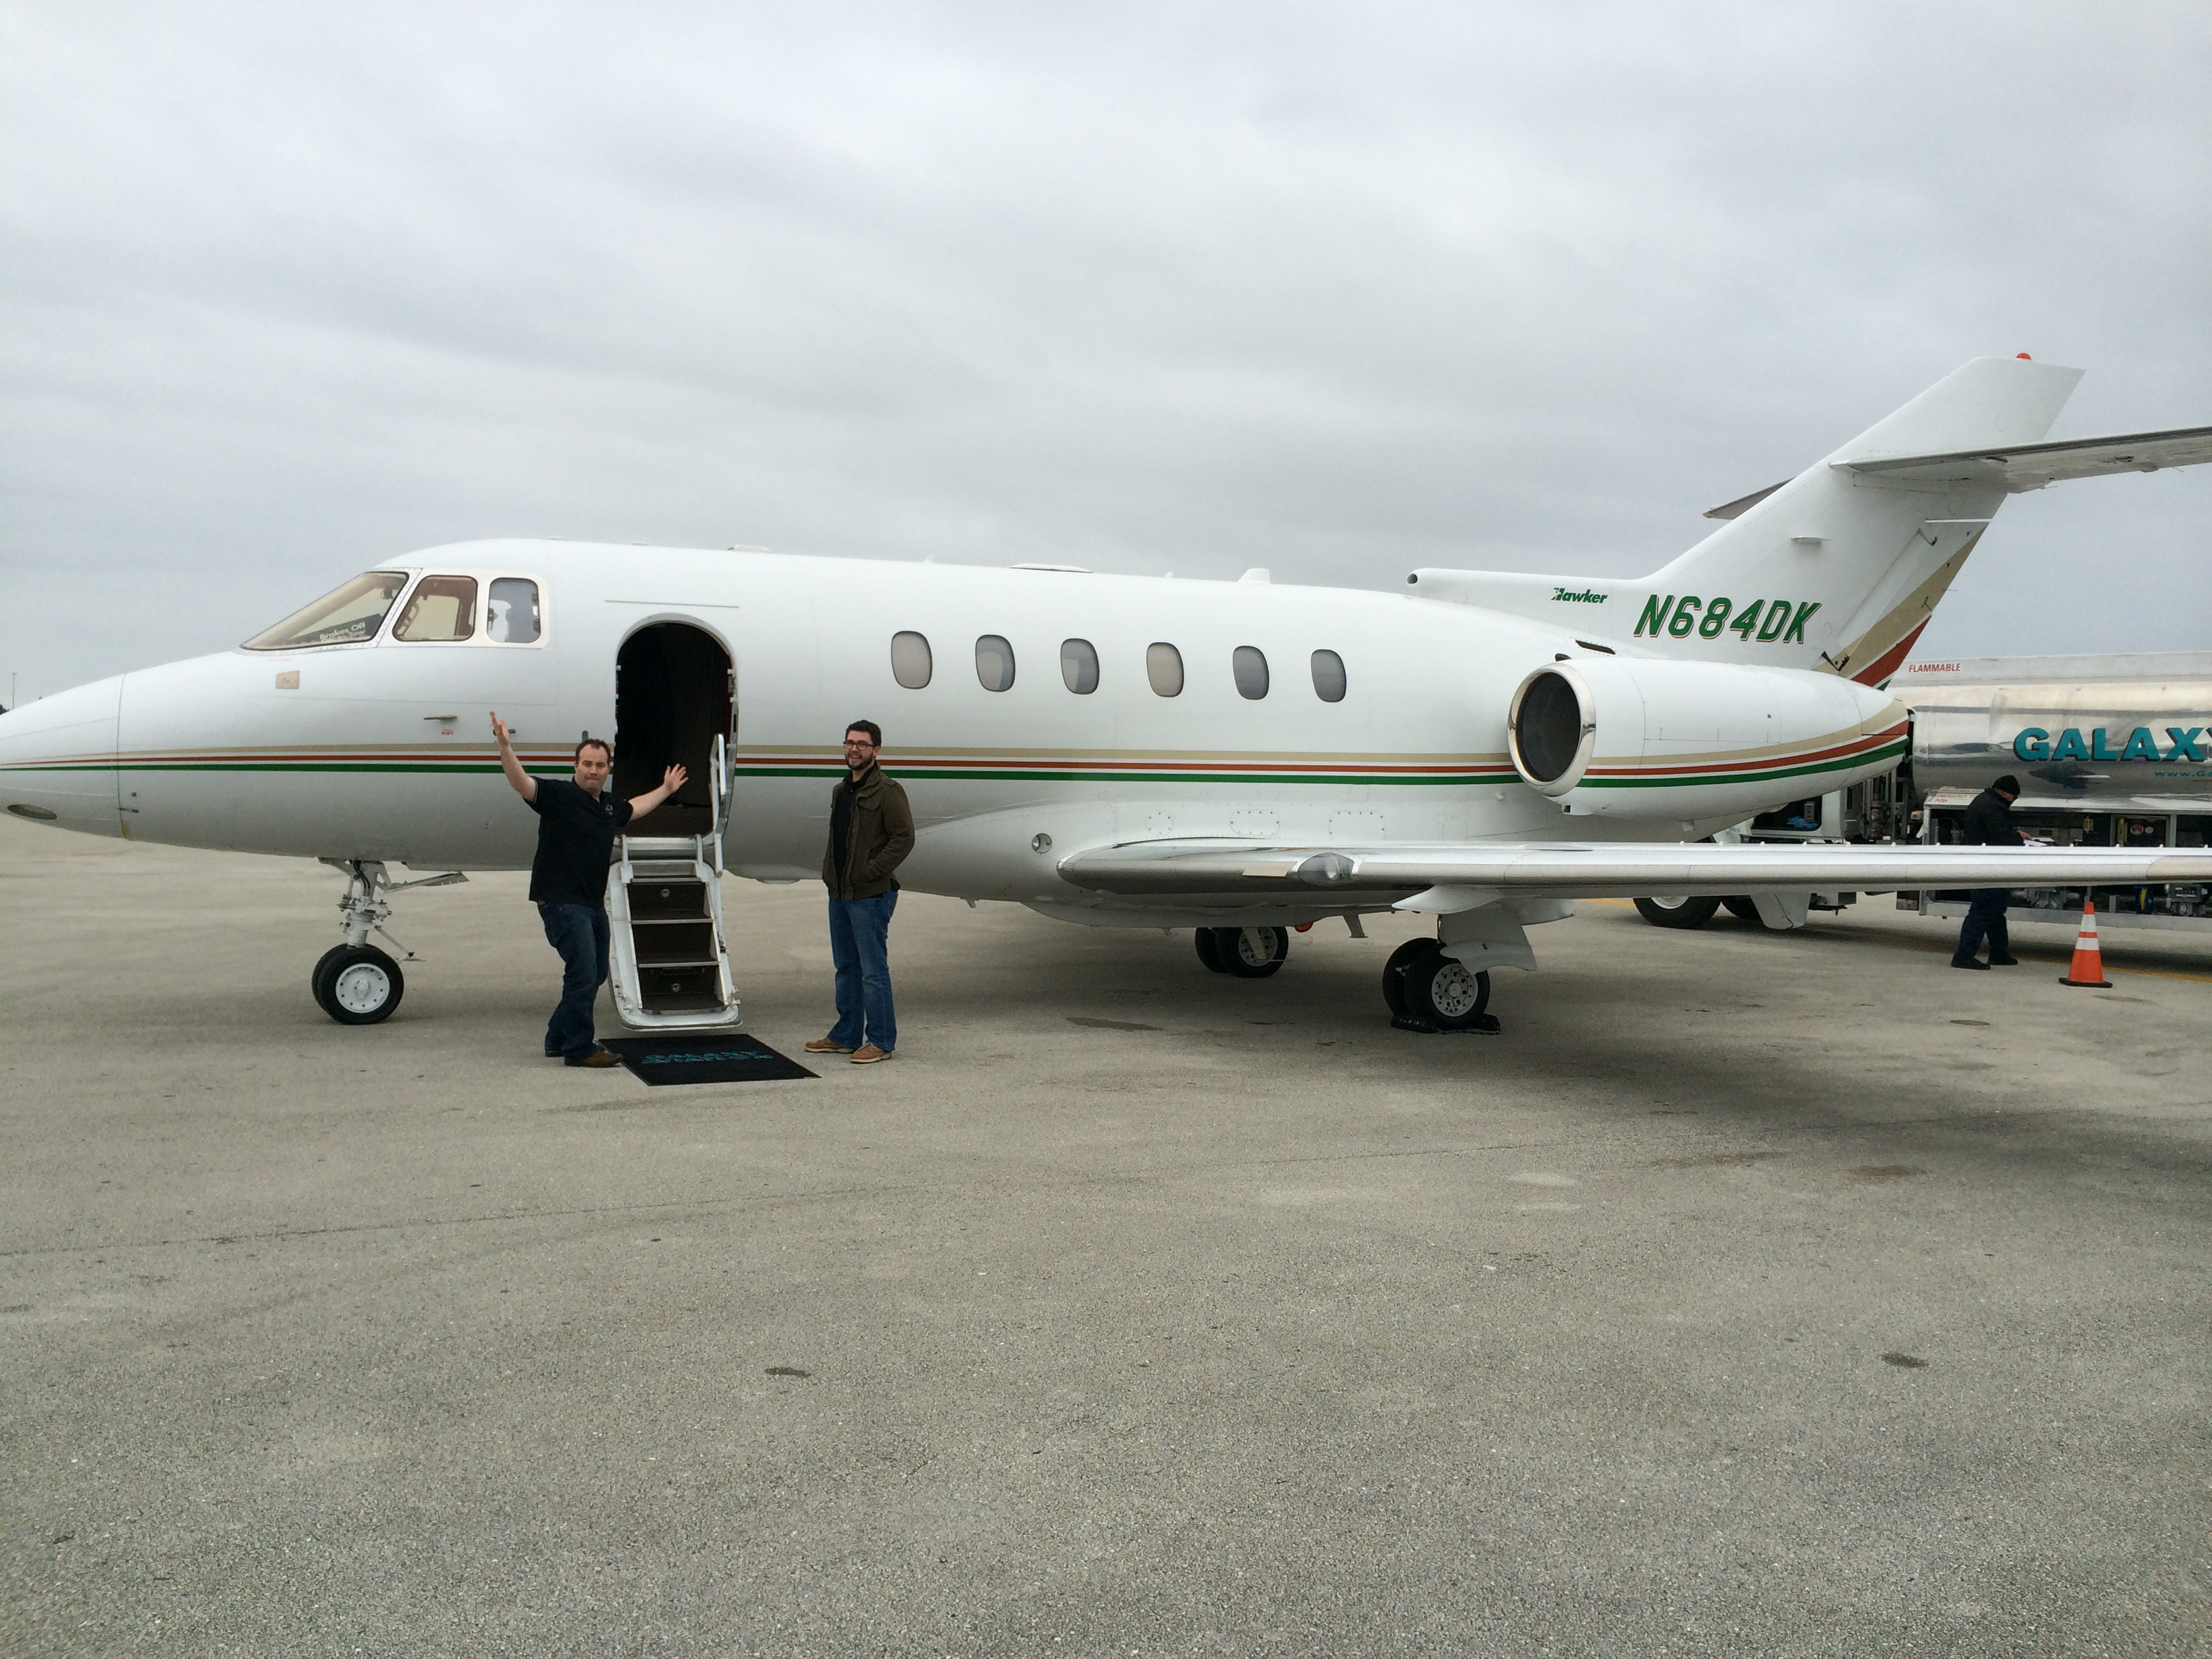 West Palm Jet Charter In West Palm Beach FL  561 5088